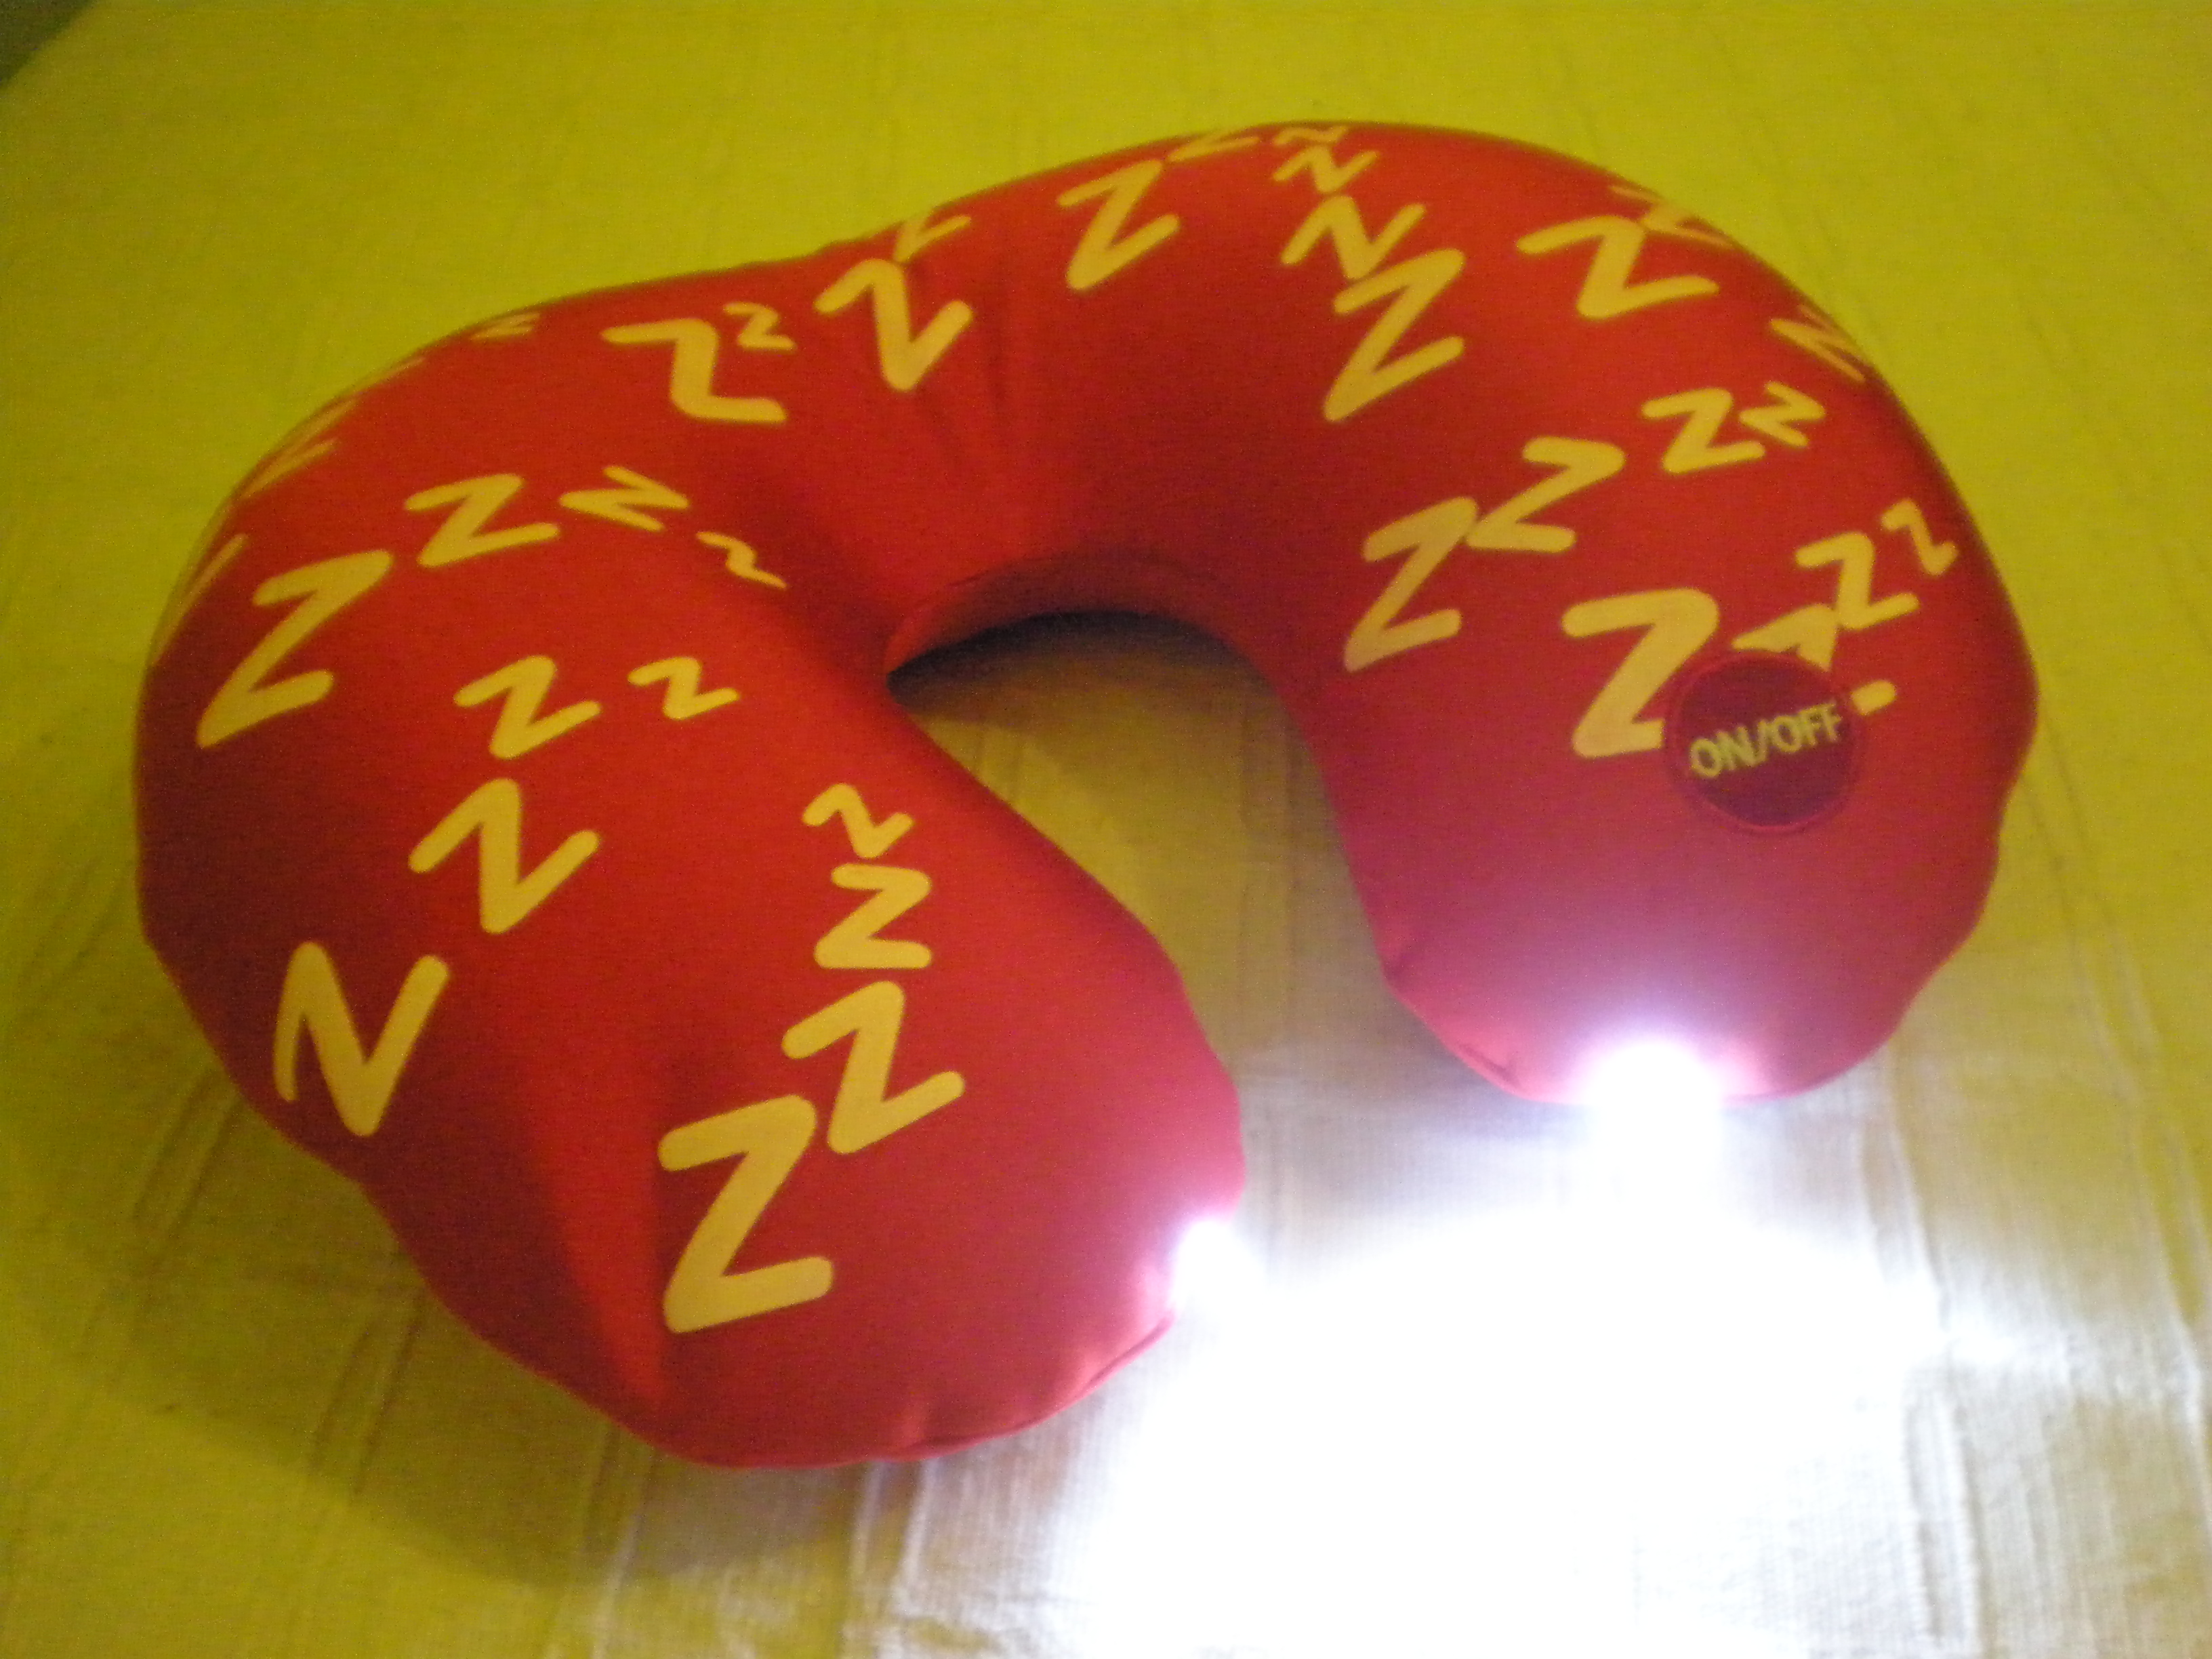 LED Neck Rest Pillow